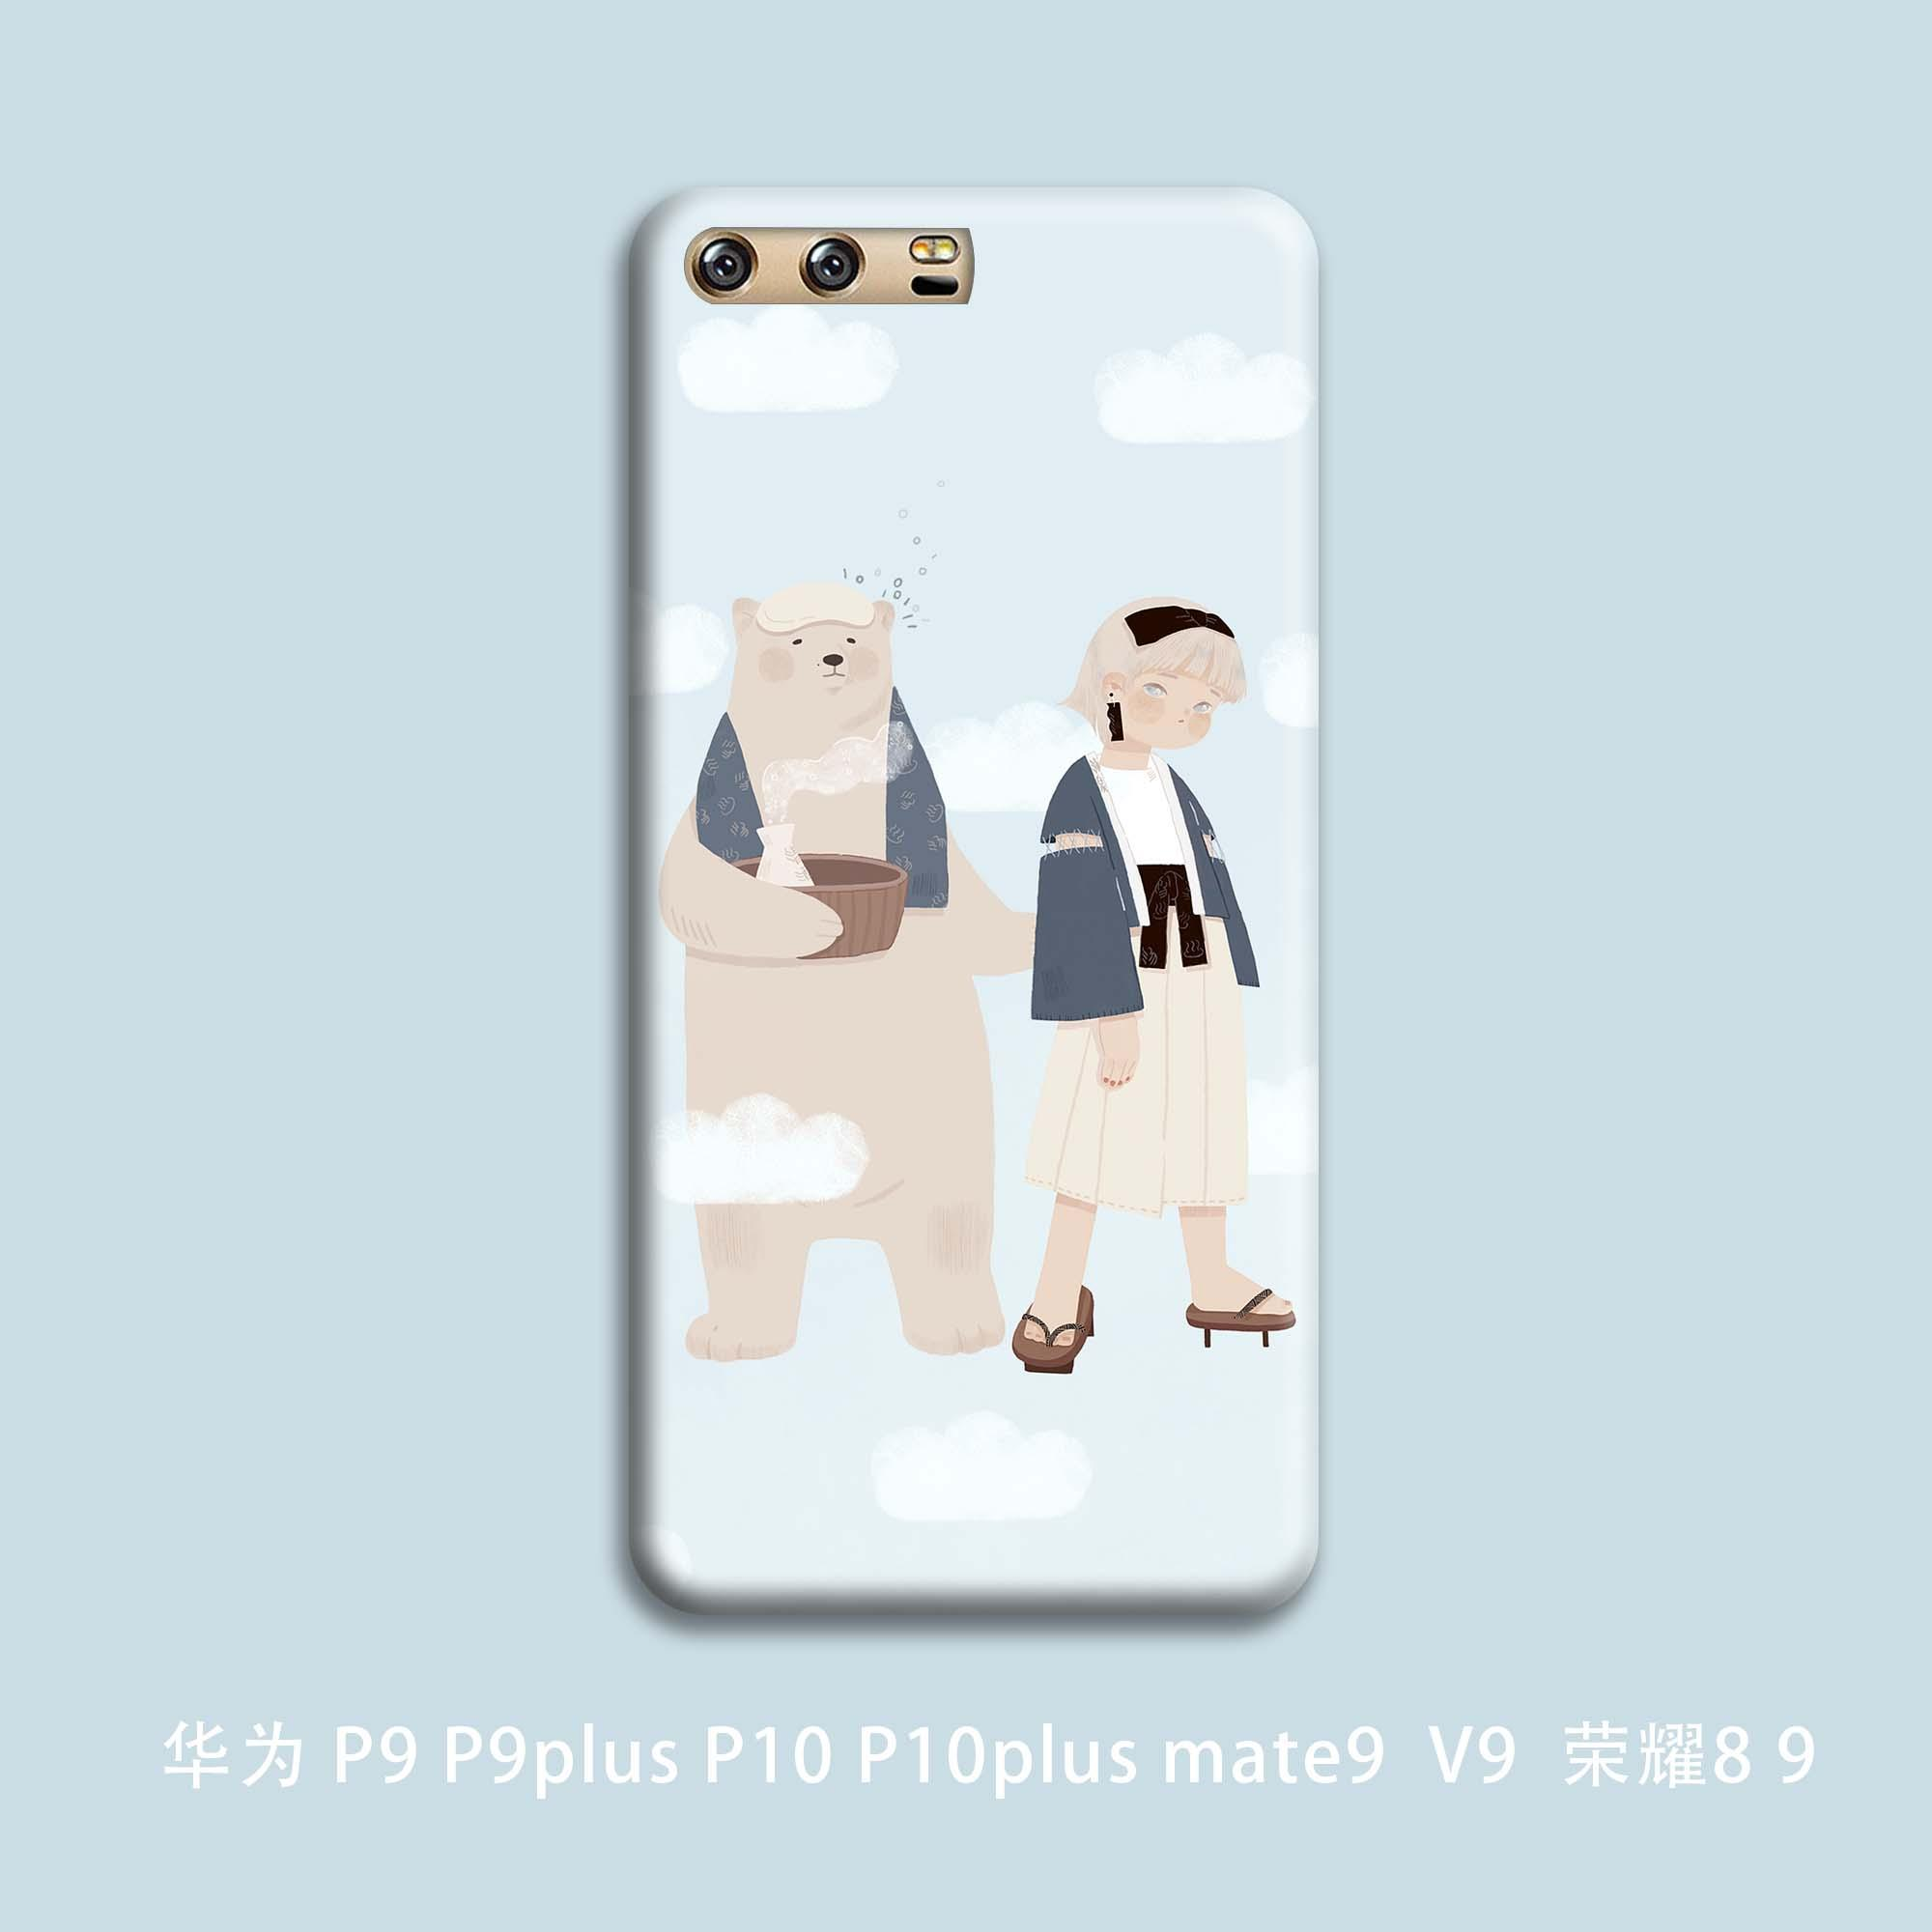 Padang Gurun Selubung Ponsel P9/P10plus/Mate9/Nova2/V9 Jepang Lulur